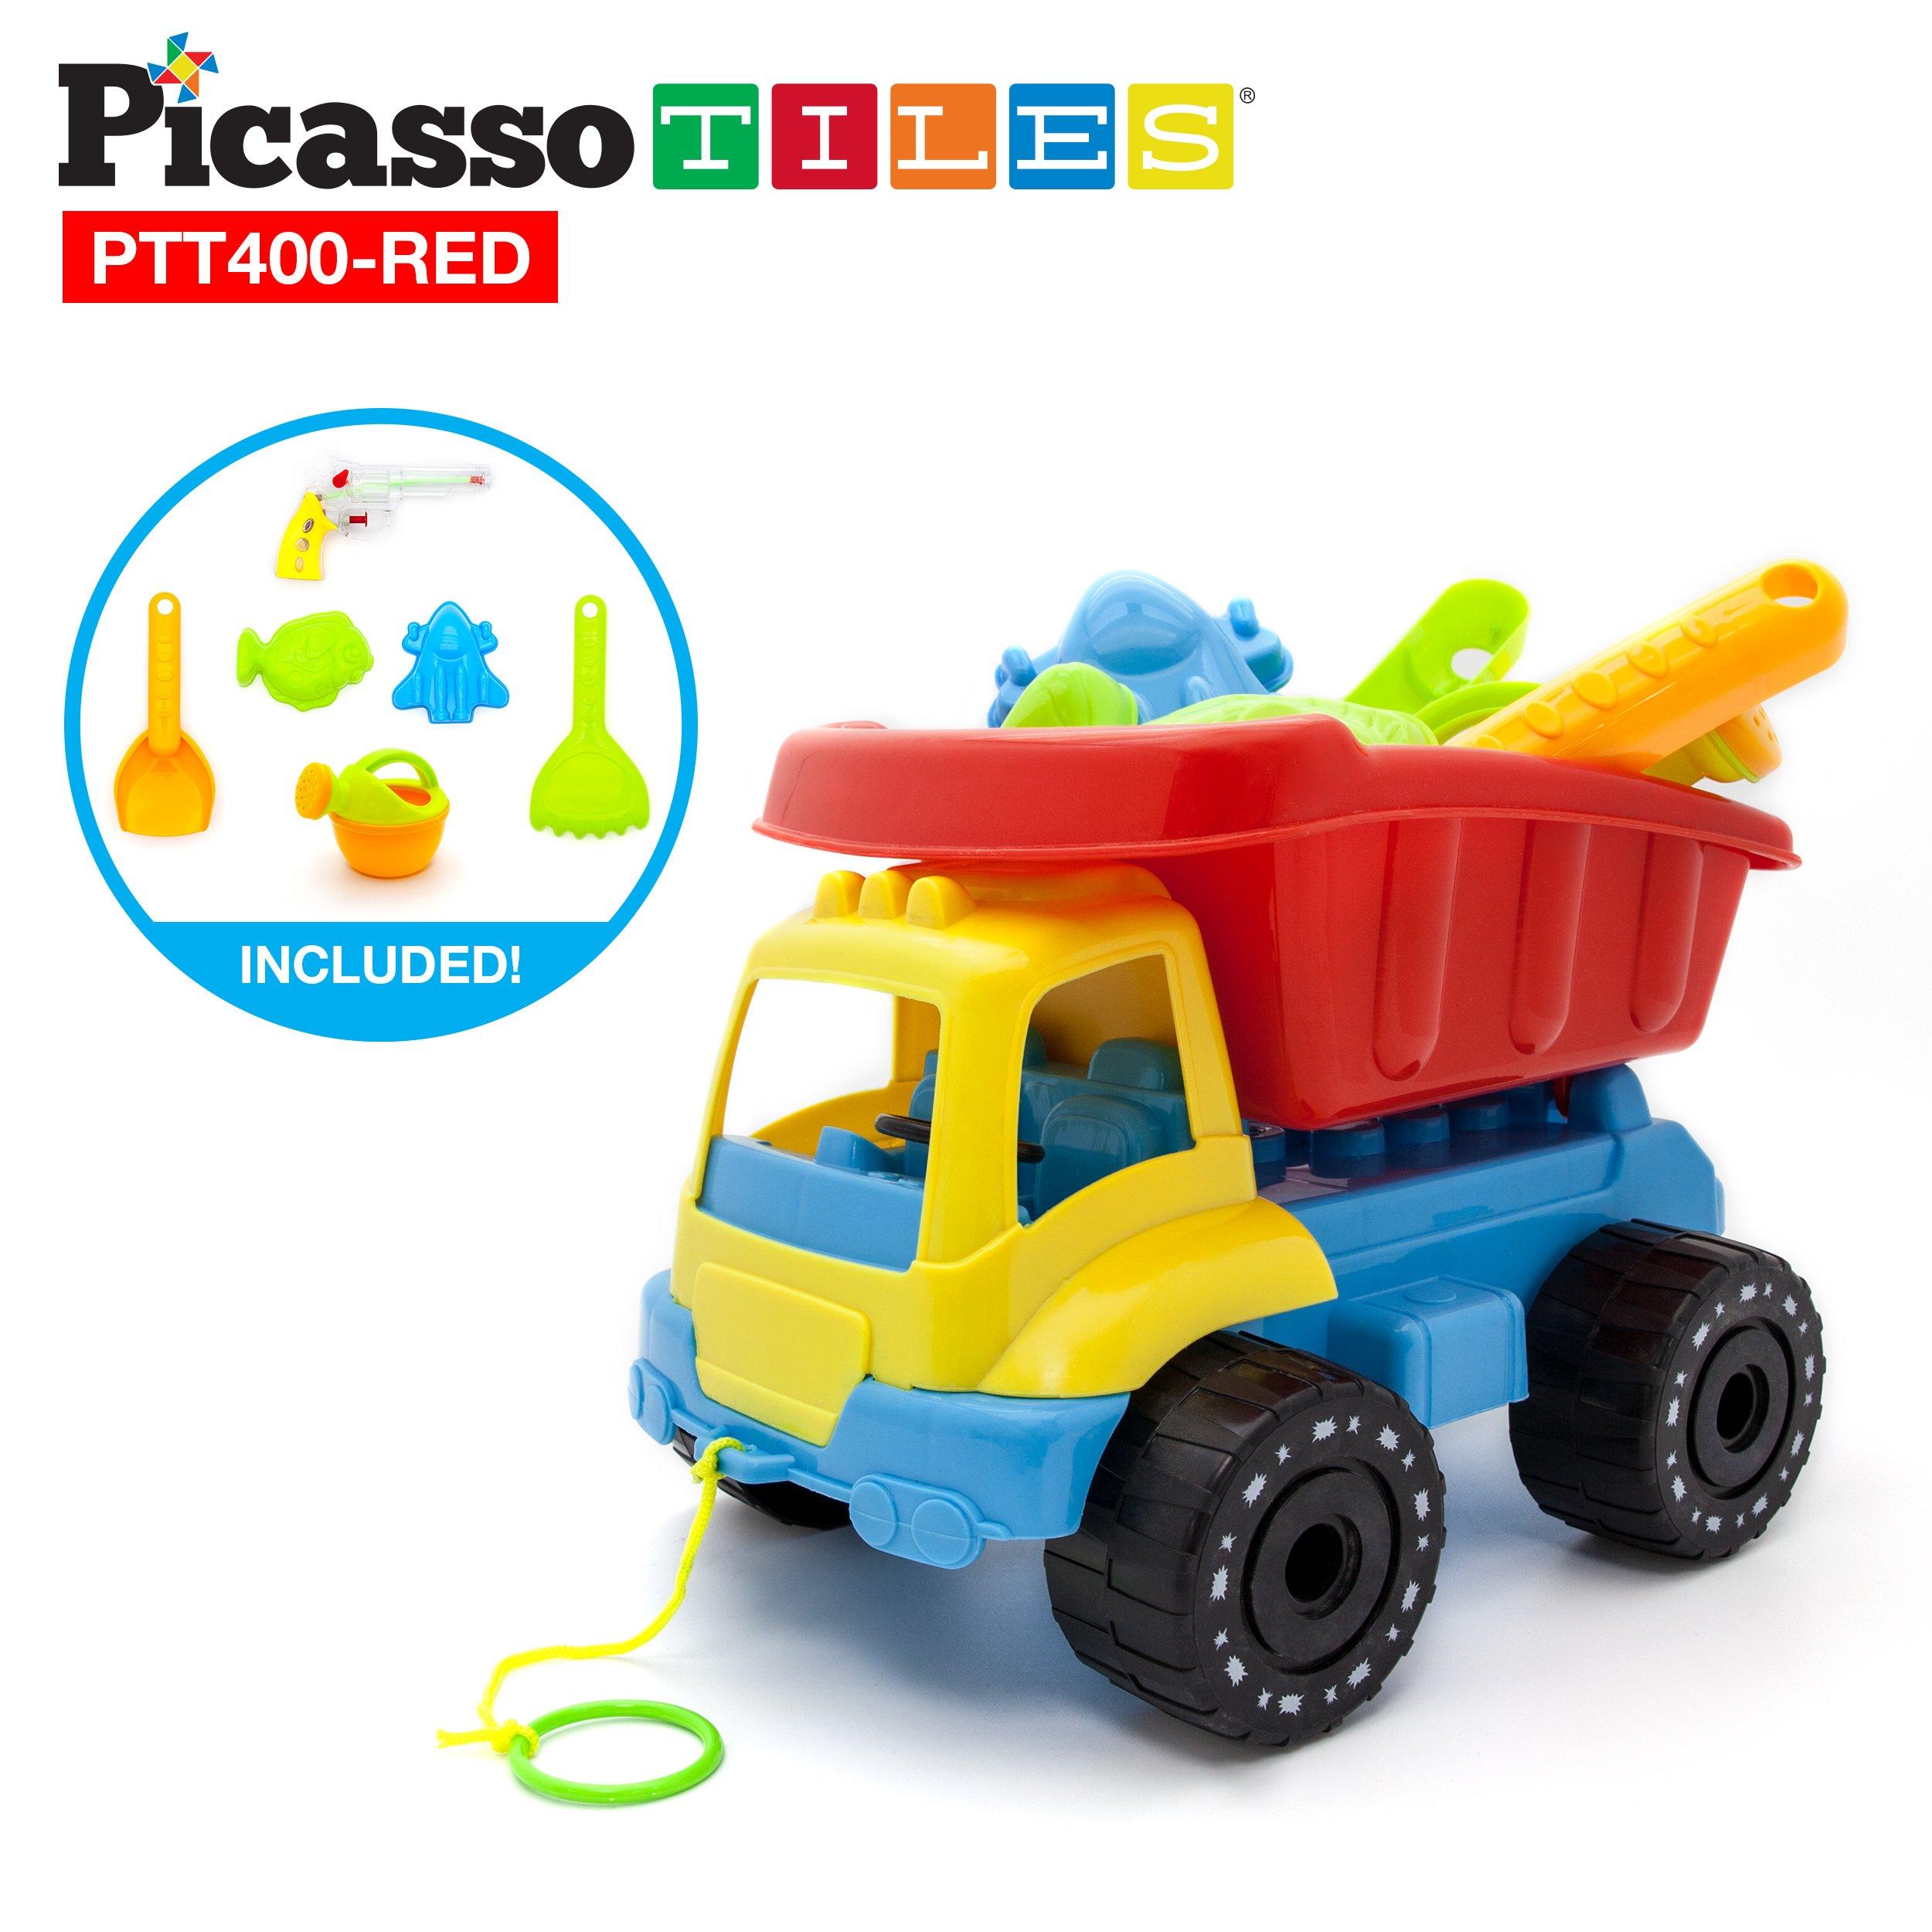 PicassoTiles PTT400 8pc Beach Toys Set Sand Box Toy Kit Combo BPA Free Safe Kid w/ Car Dump Load Truck, Shovel, Rake, Fish Mold, Spaceship, Pull Bar, Water Gun & Can Children Outdoor Fun Play